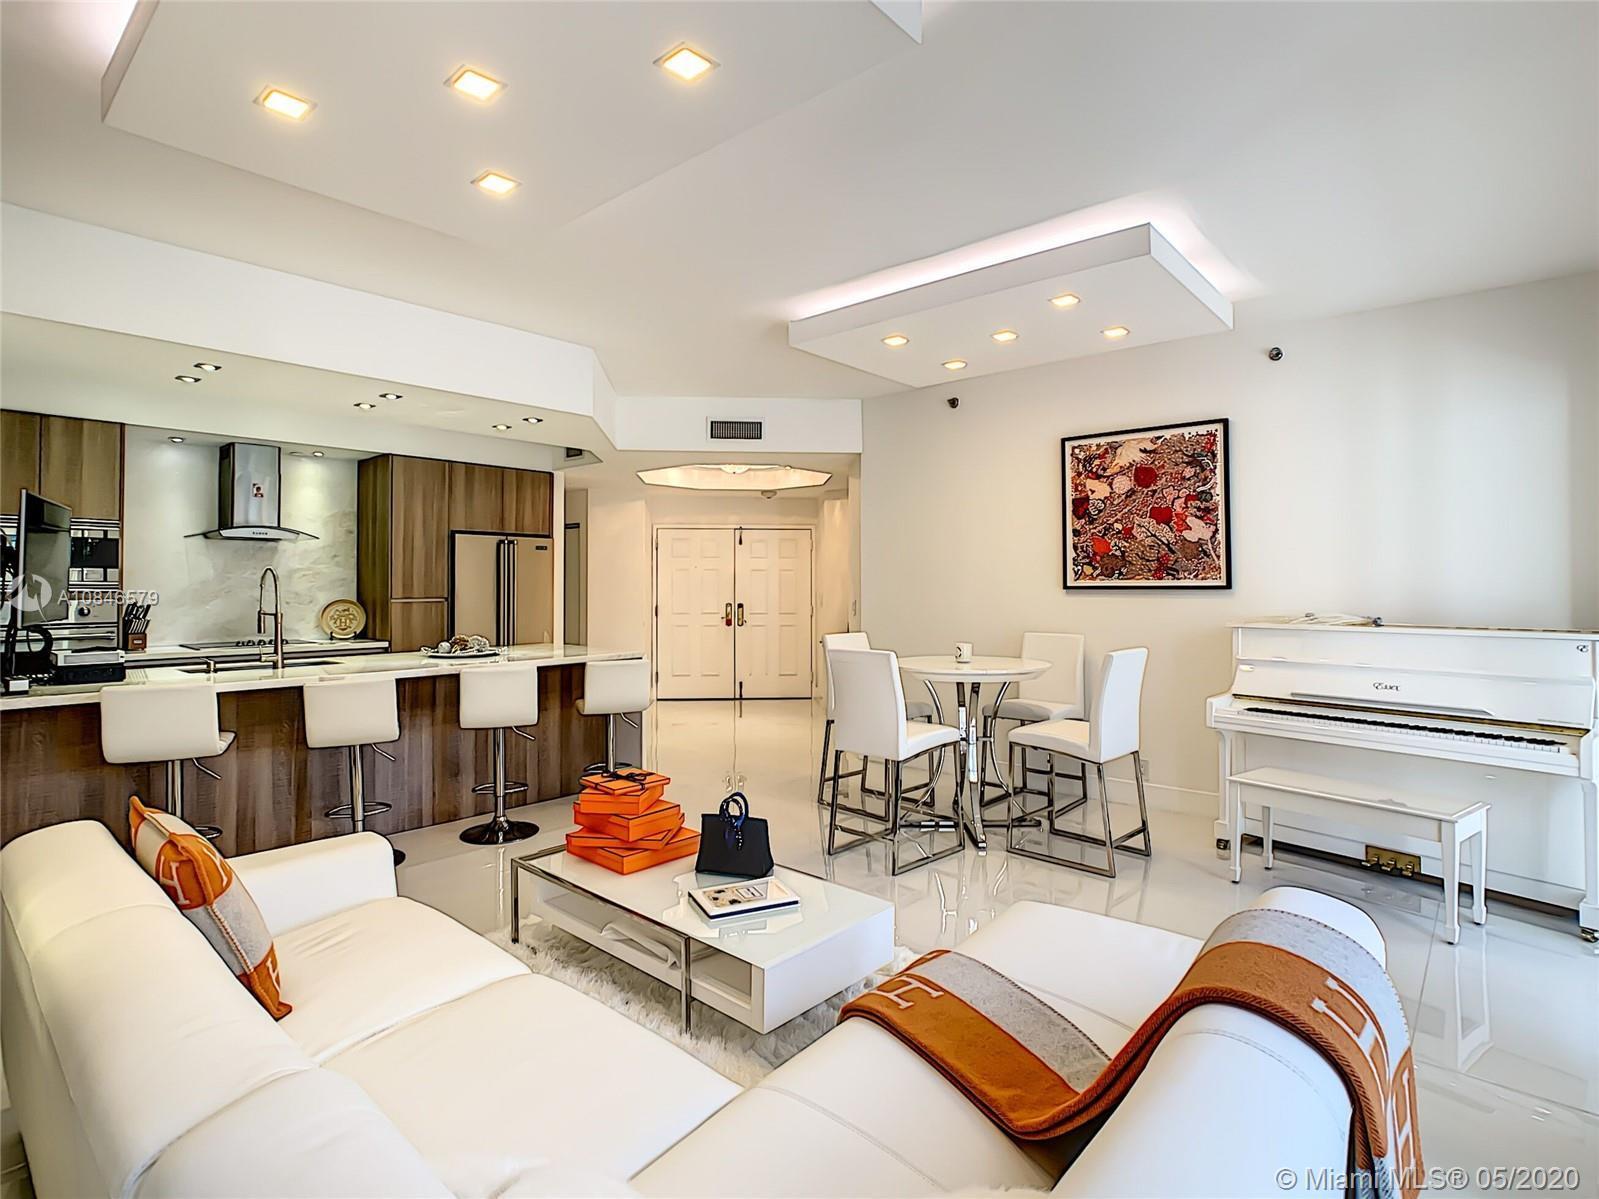 5-Star resort living in the prestigious Williams Island. The stunning, renovated unit encompasses 3